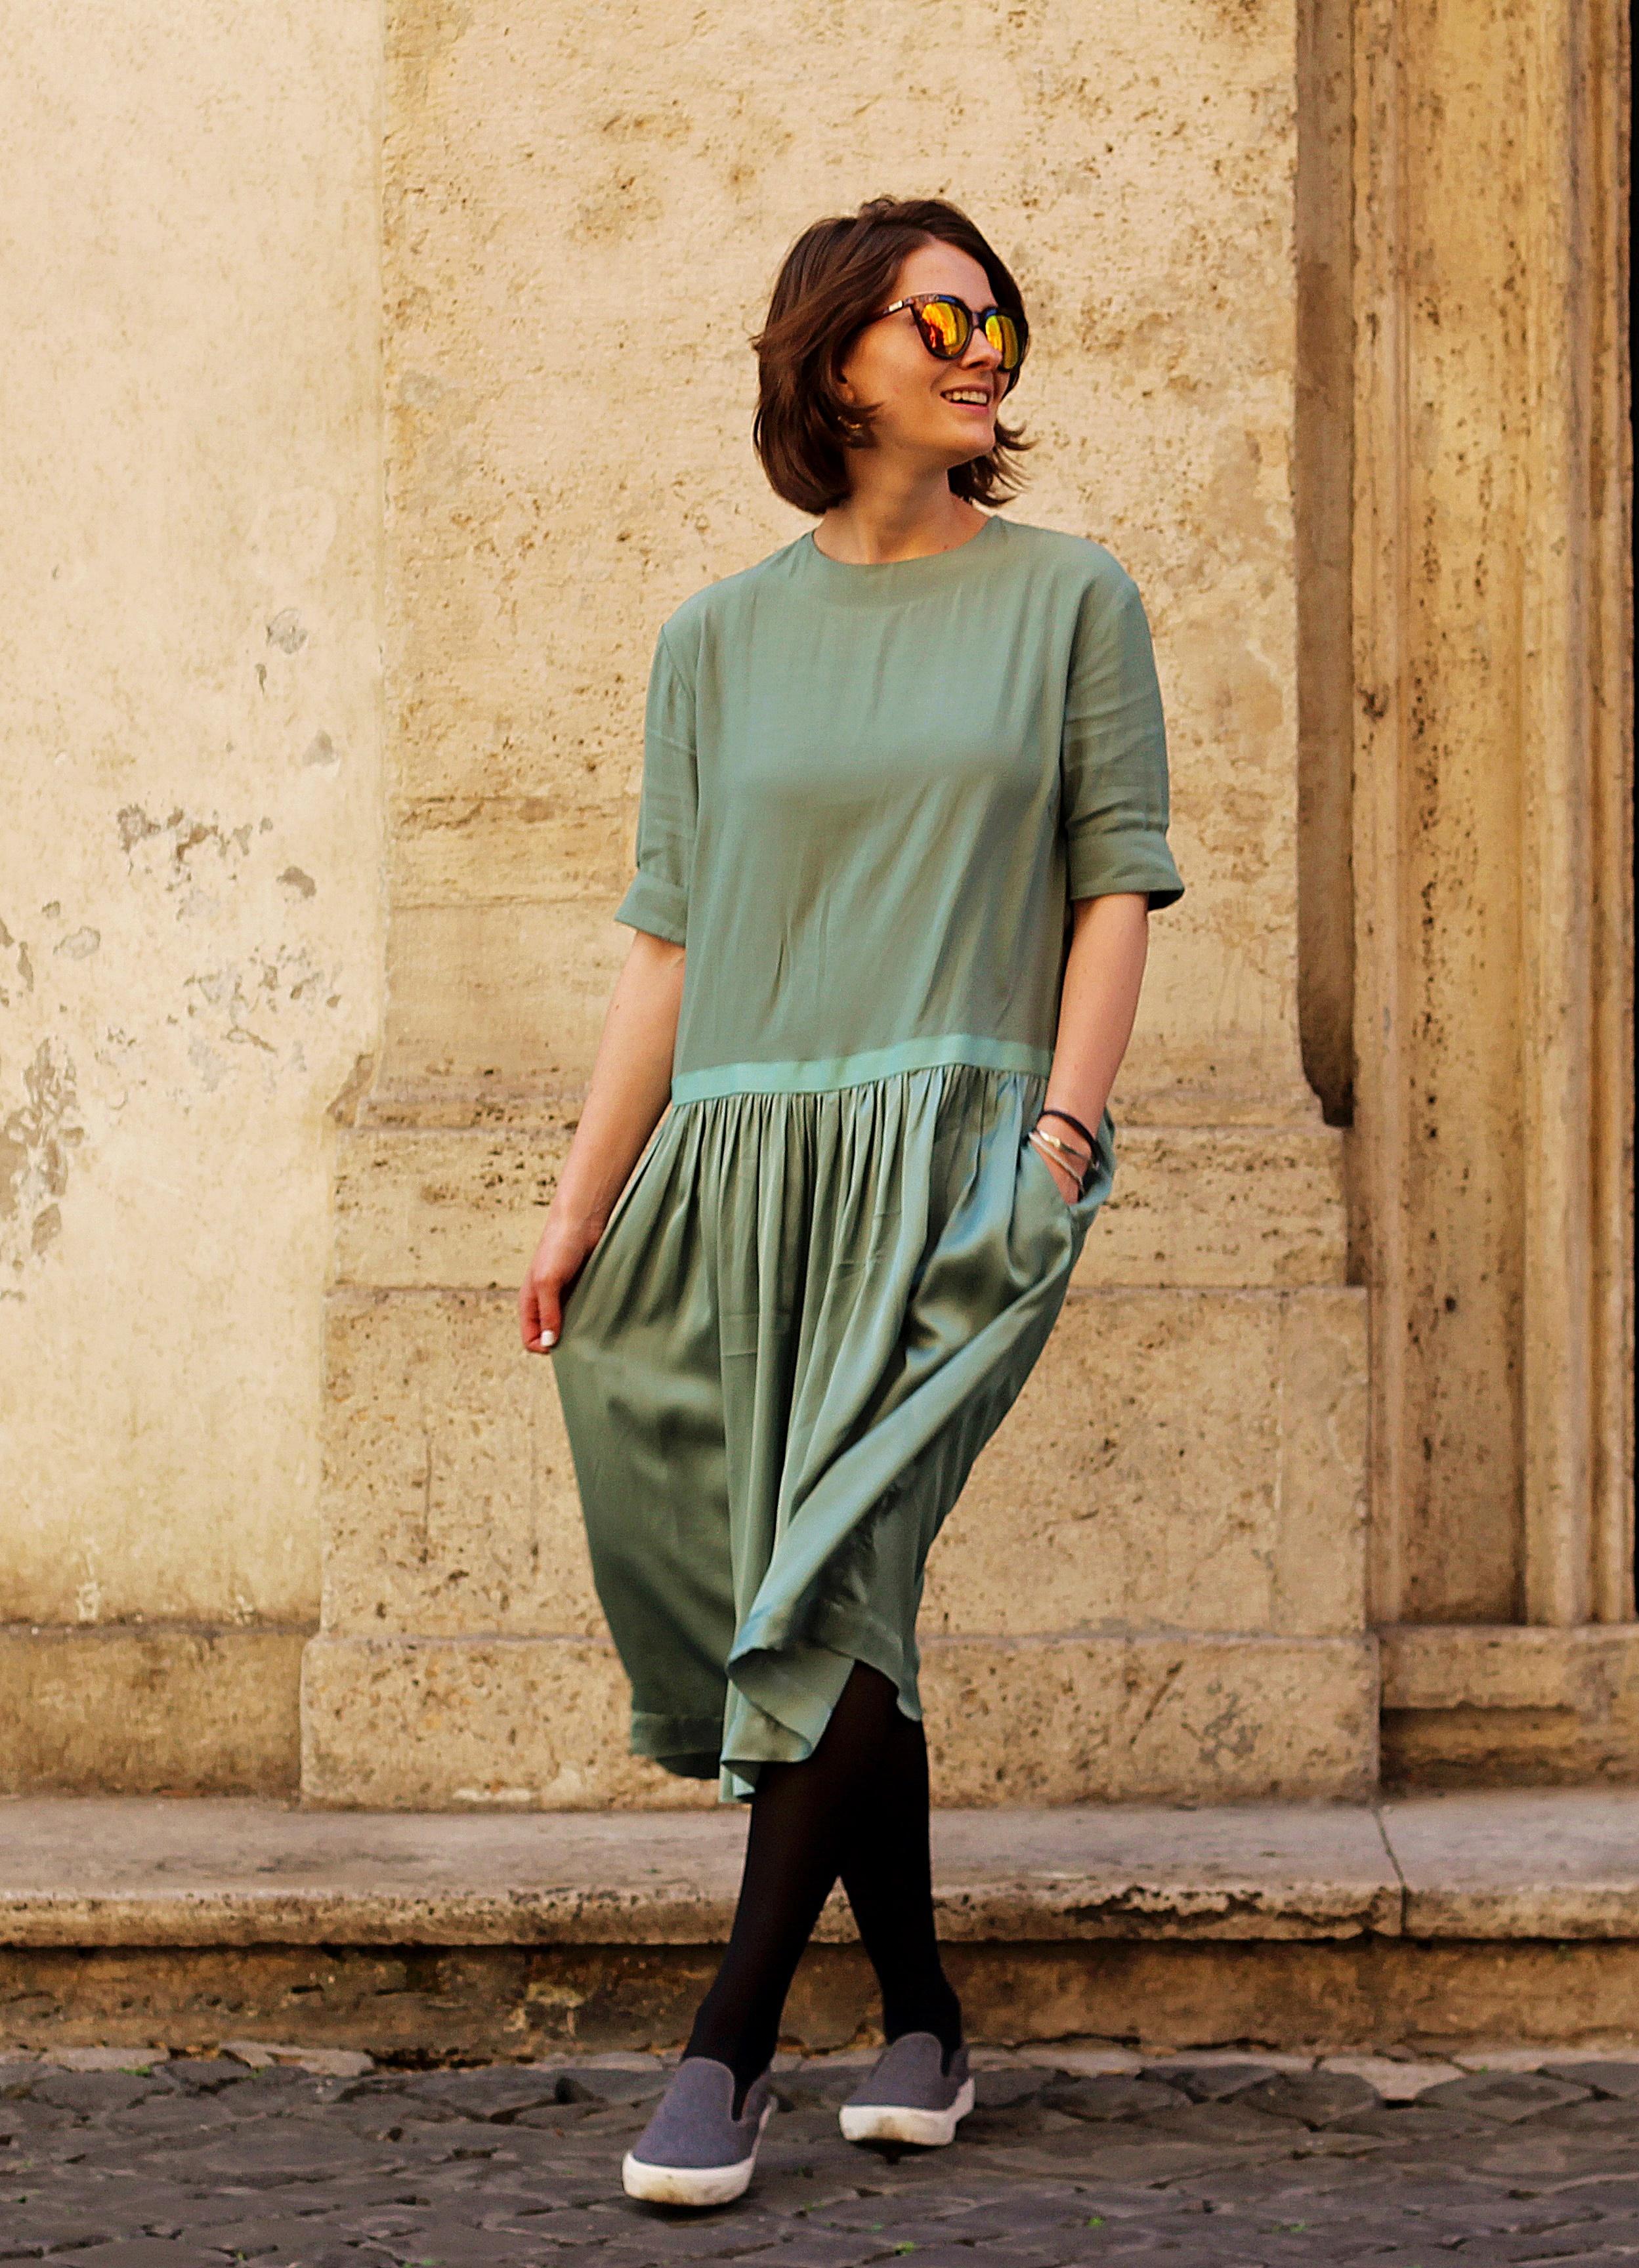 ann-a-porter-fashion-blog-roma-italy-blogger-annaporter(2)_edited